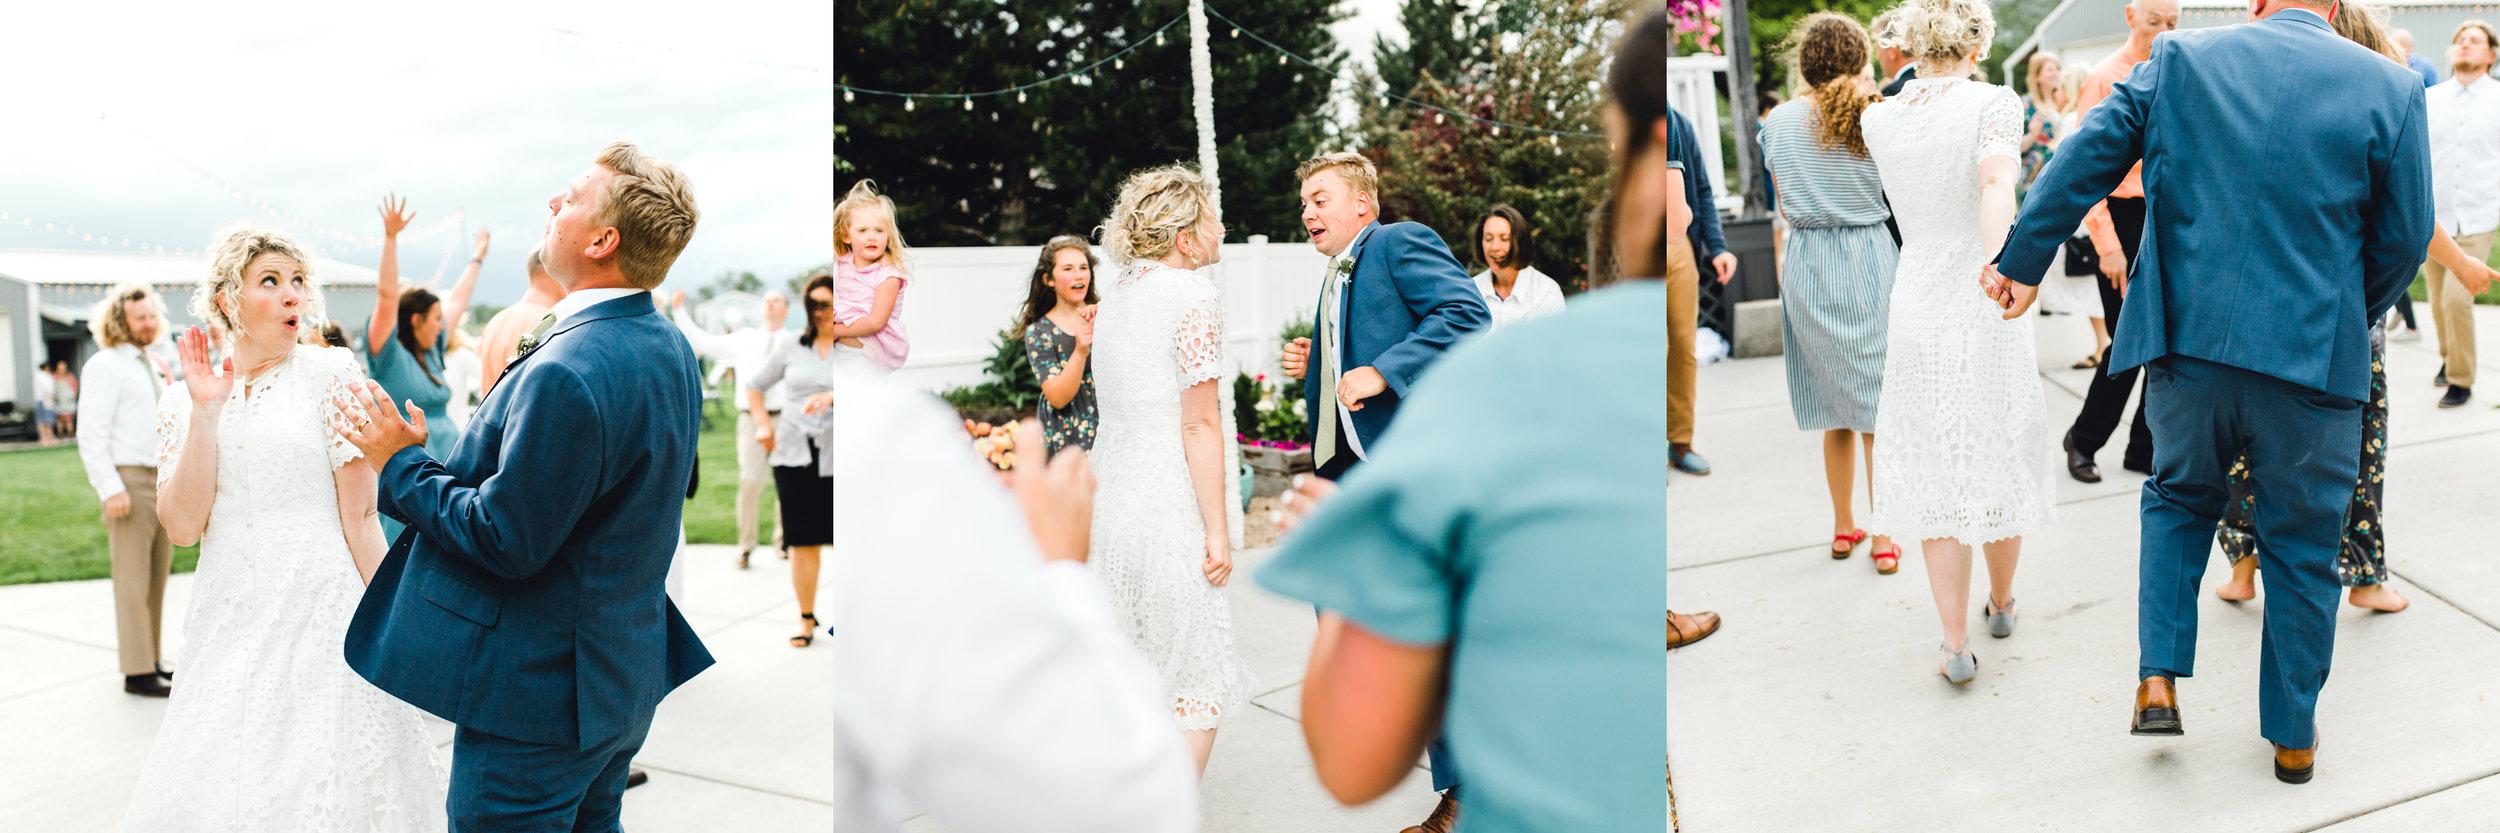 beautiful-outdoor-backyard-wedding-reception-anna-christine-photography-rexburg-idaho-21.jpg